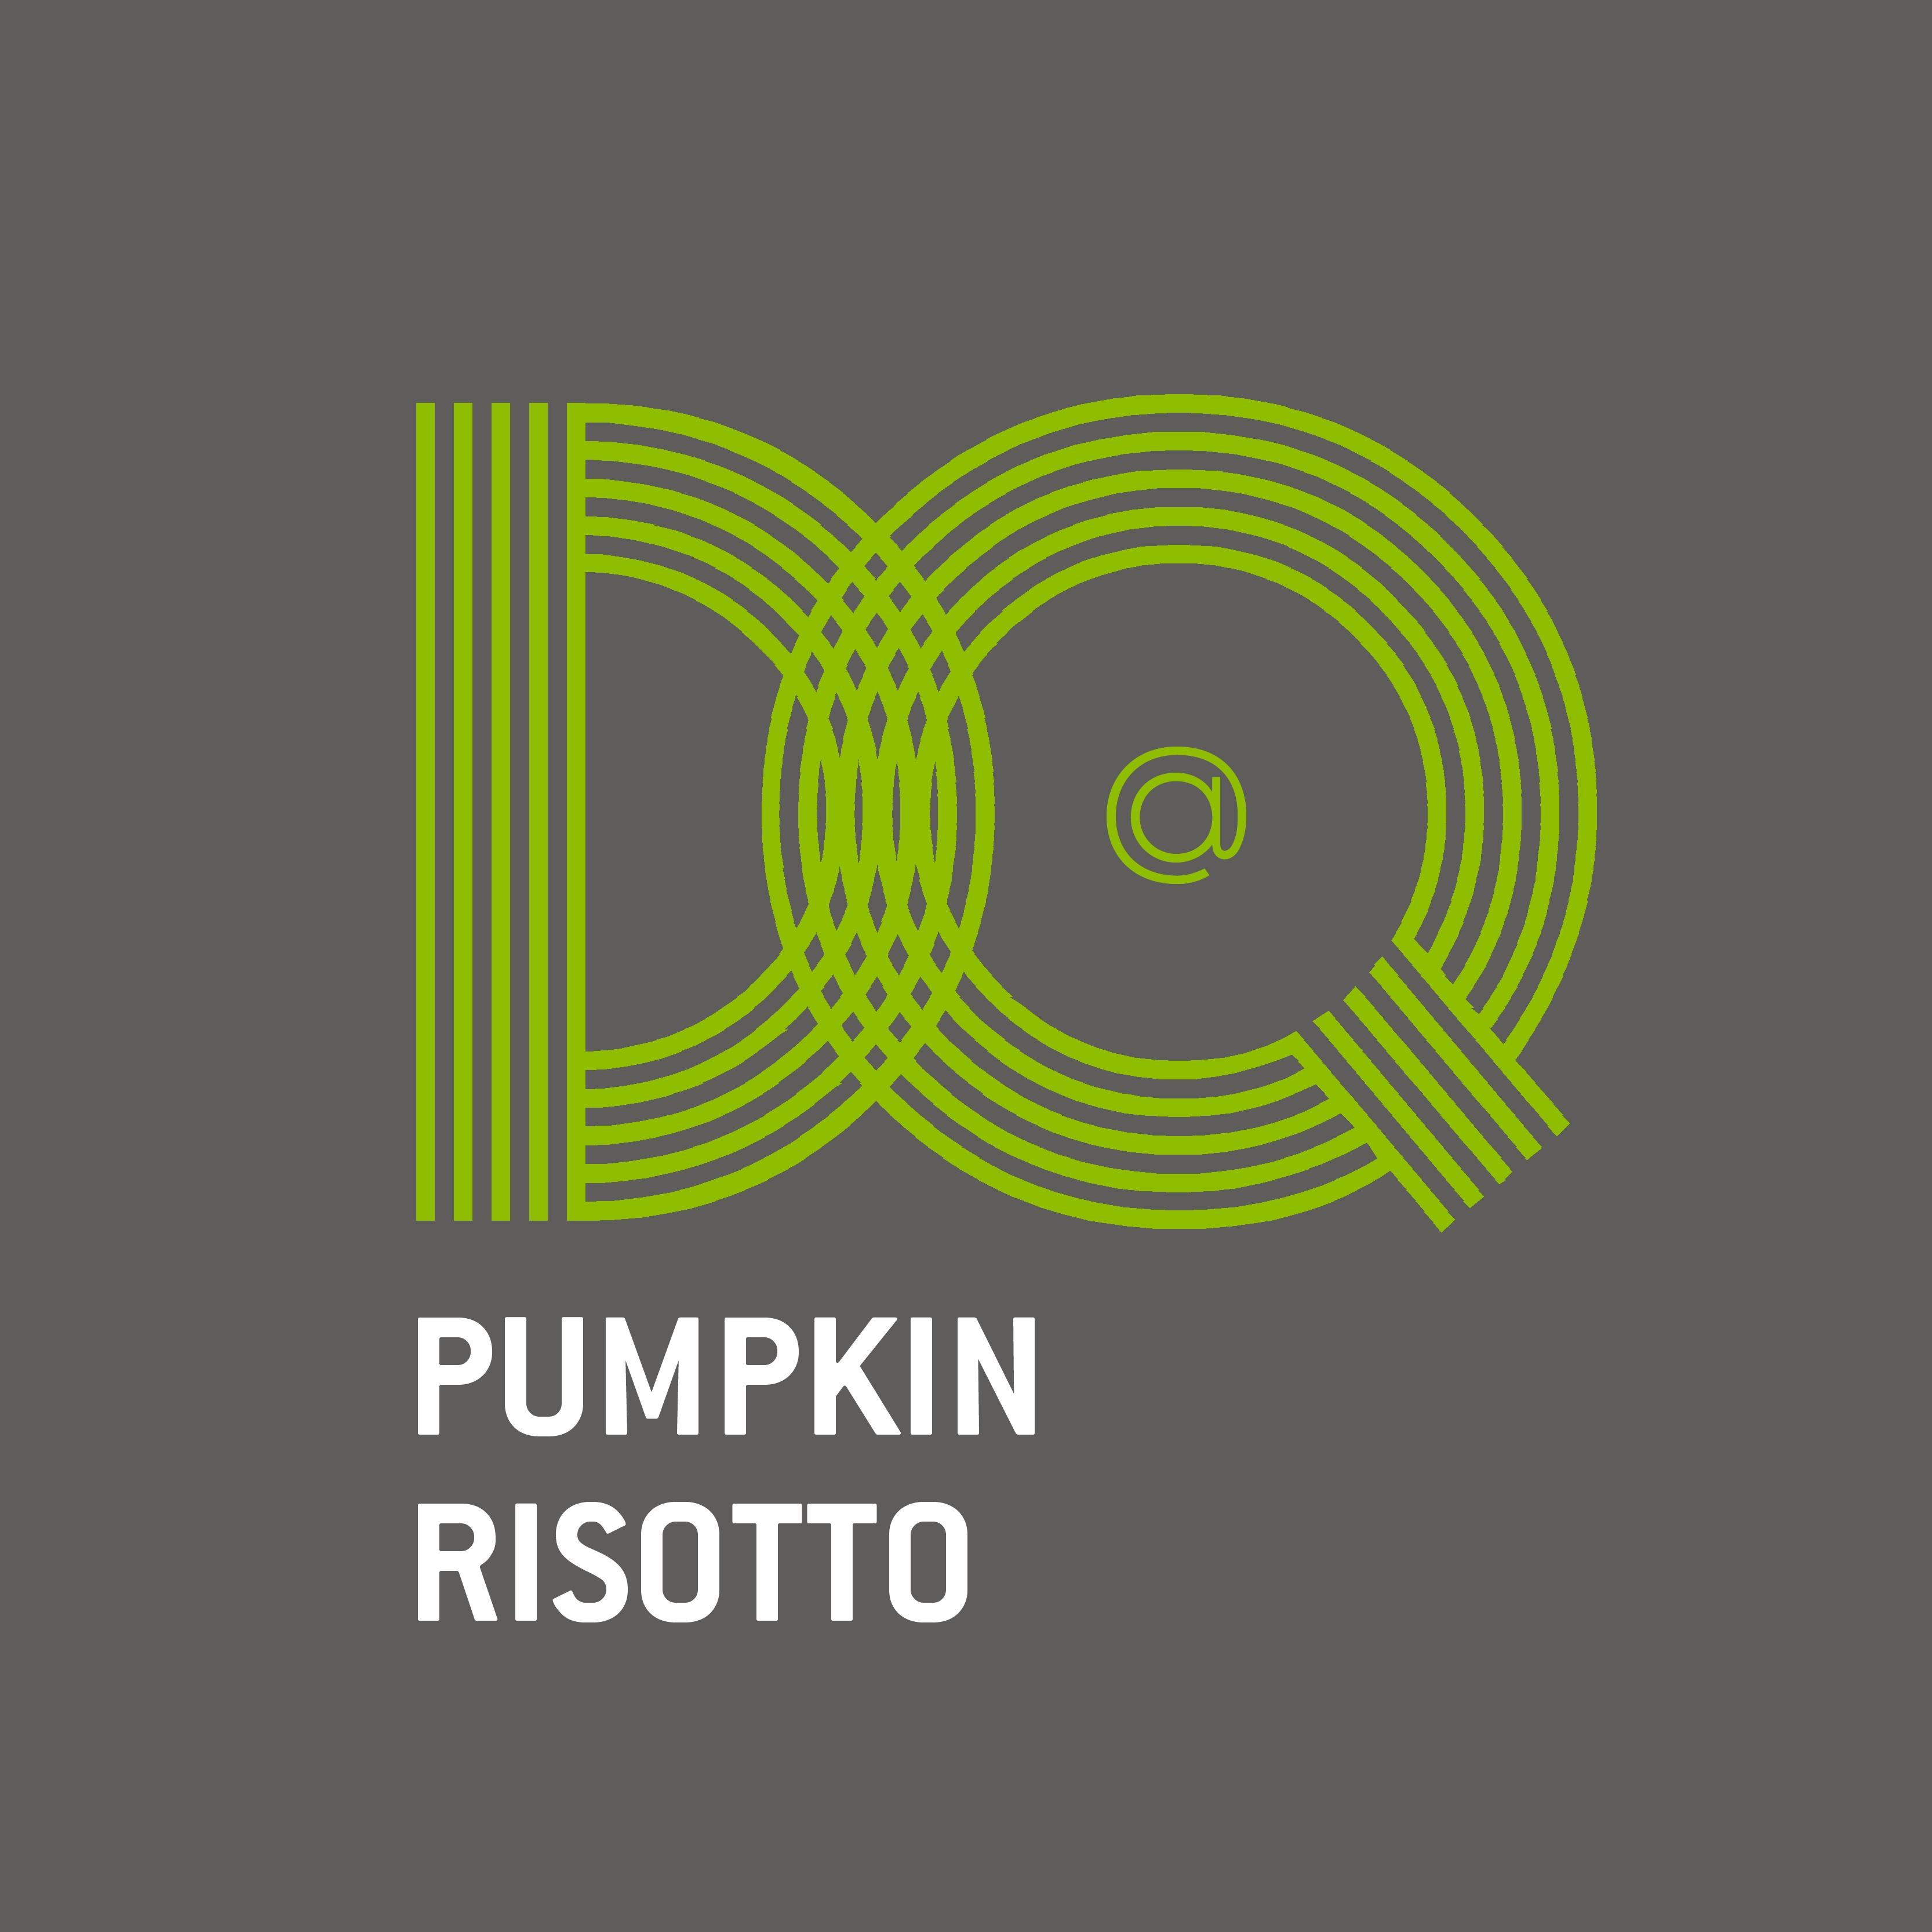 09. DQ - PUMPKIN RISOTTO